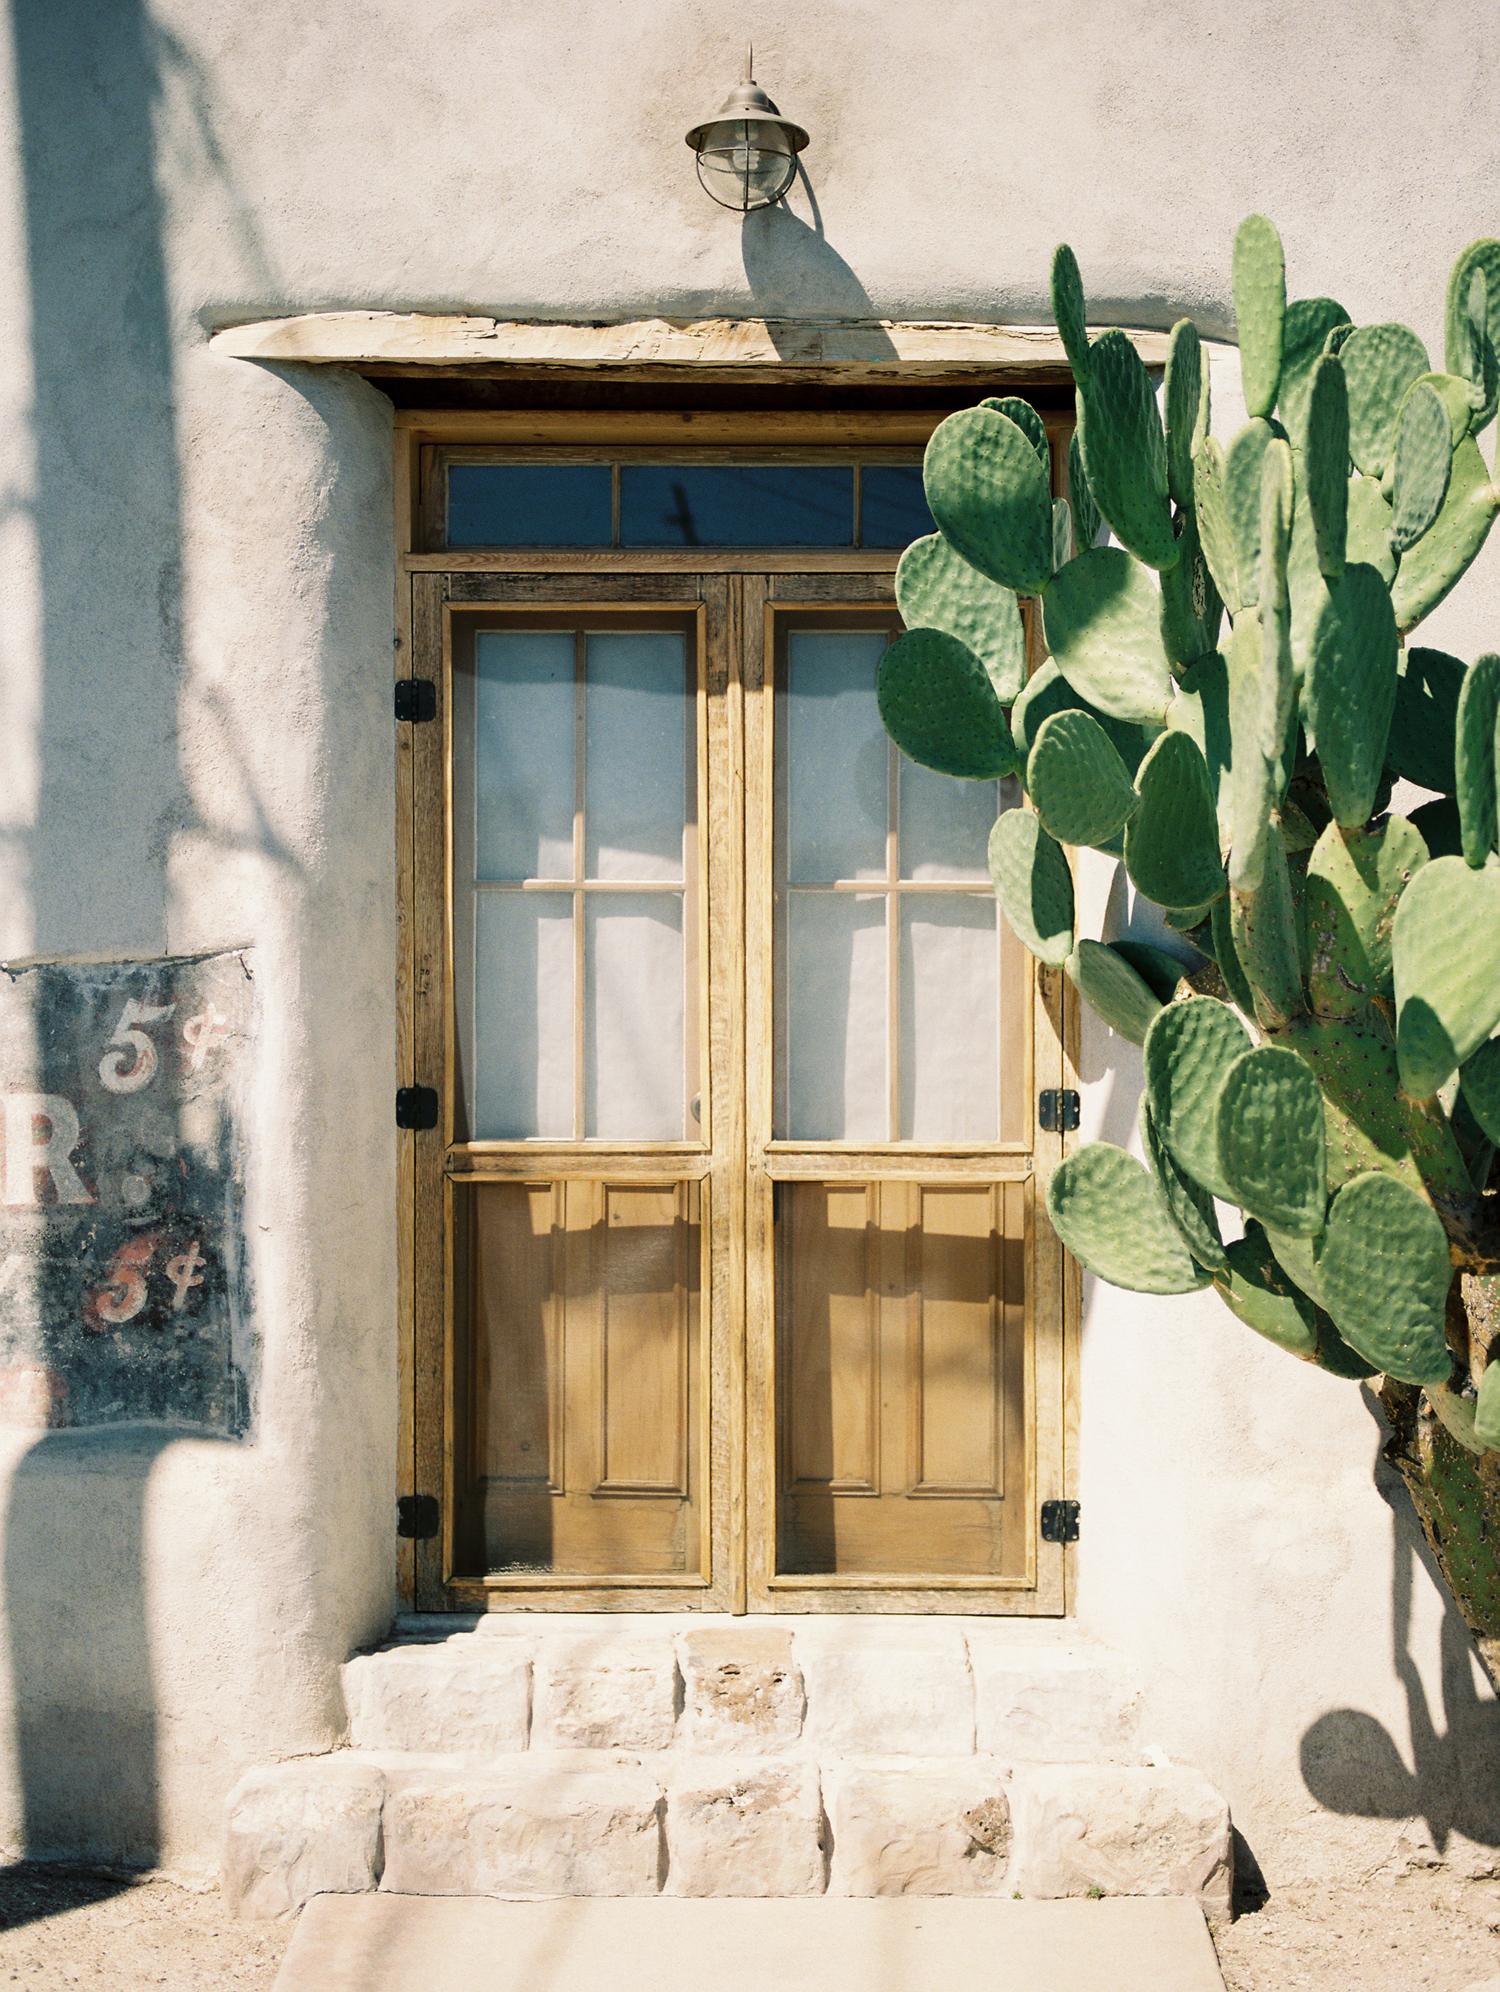 Tucson Barrio old door with cactus